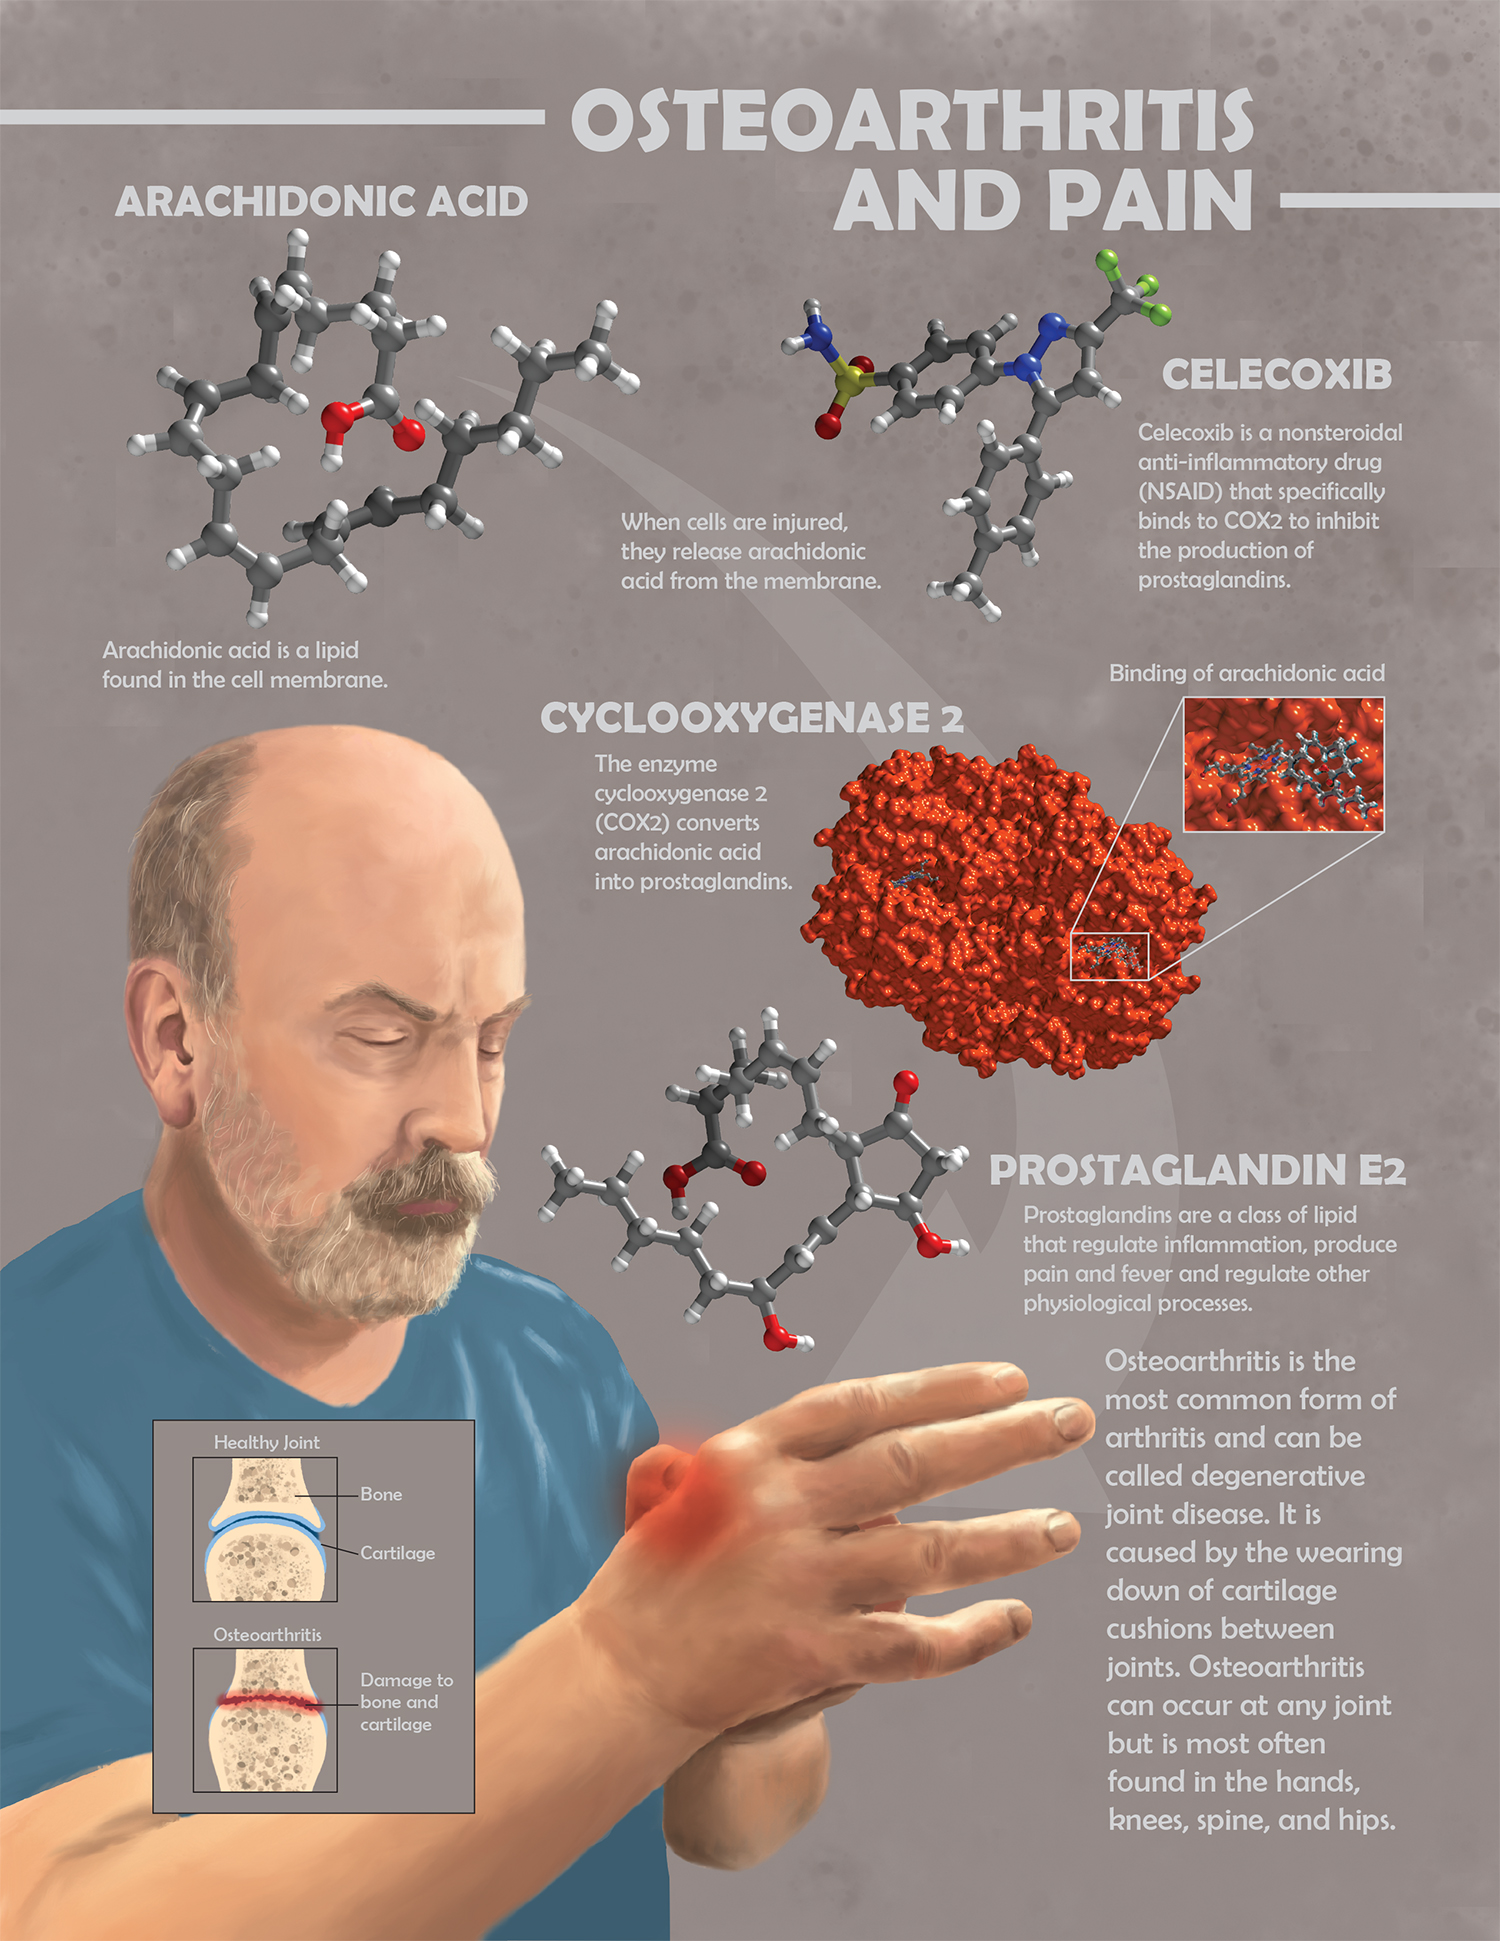 An illustration explaining osteoarthritis and pain.